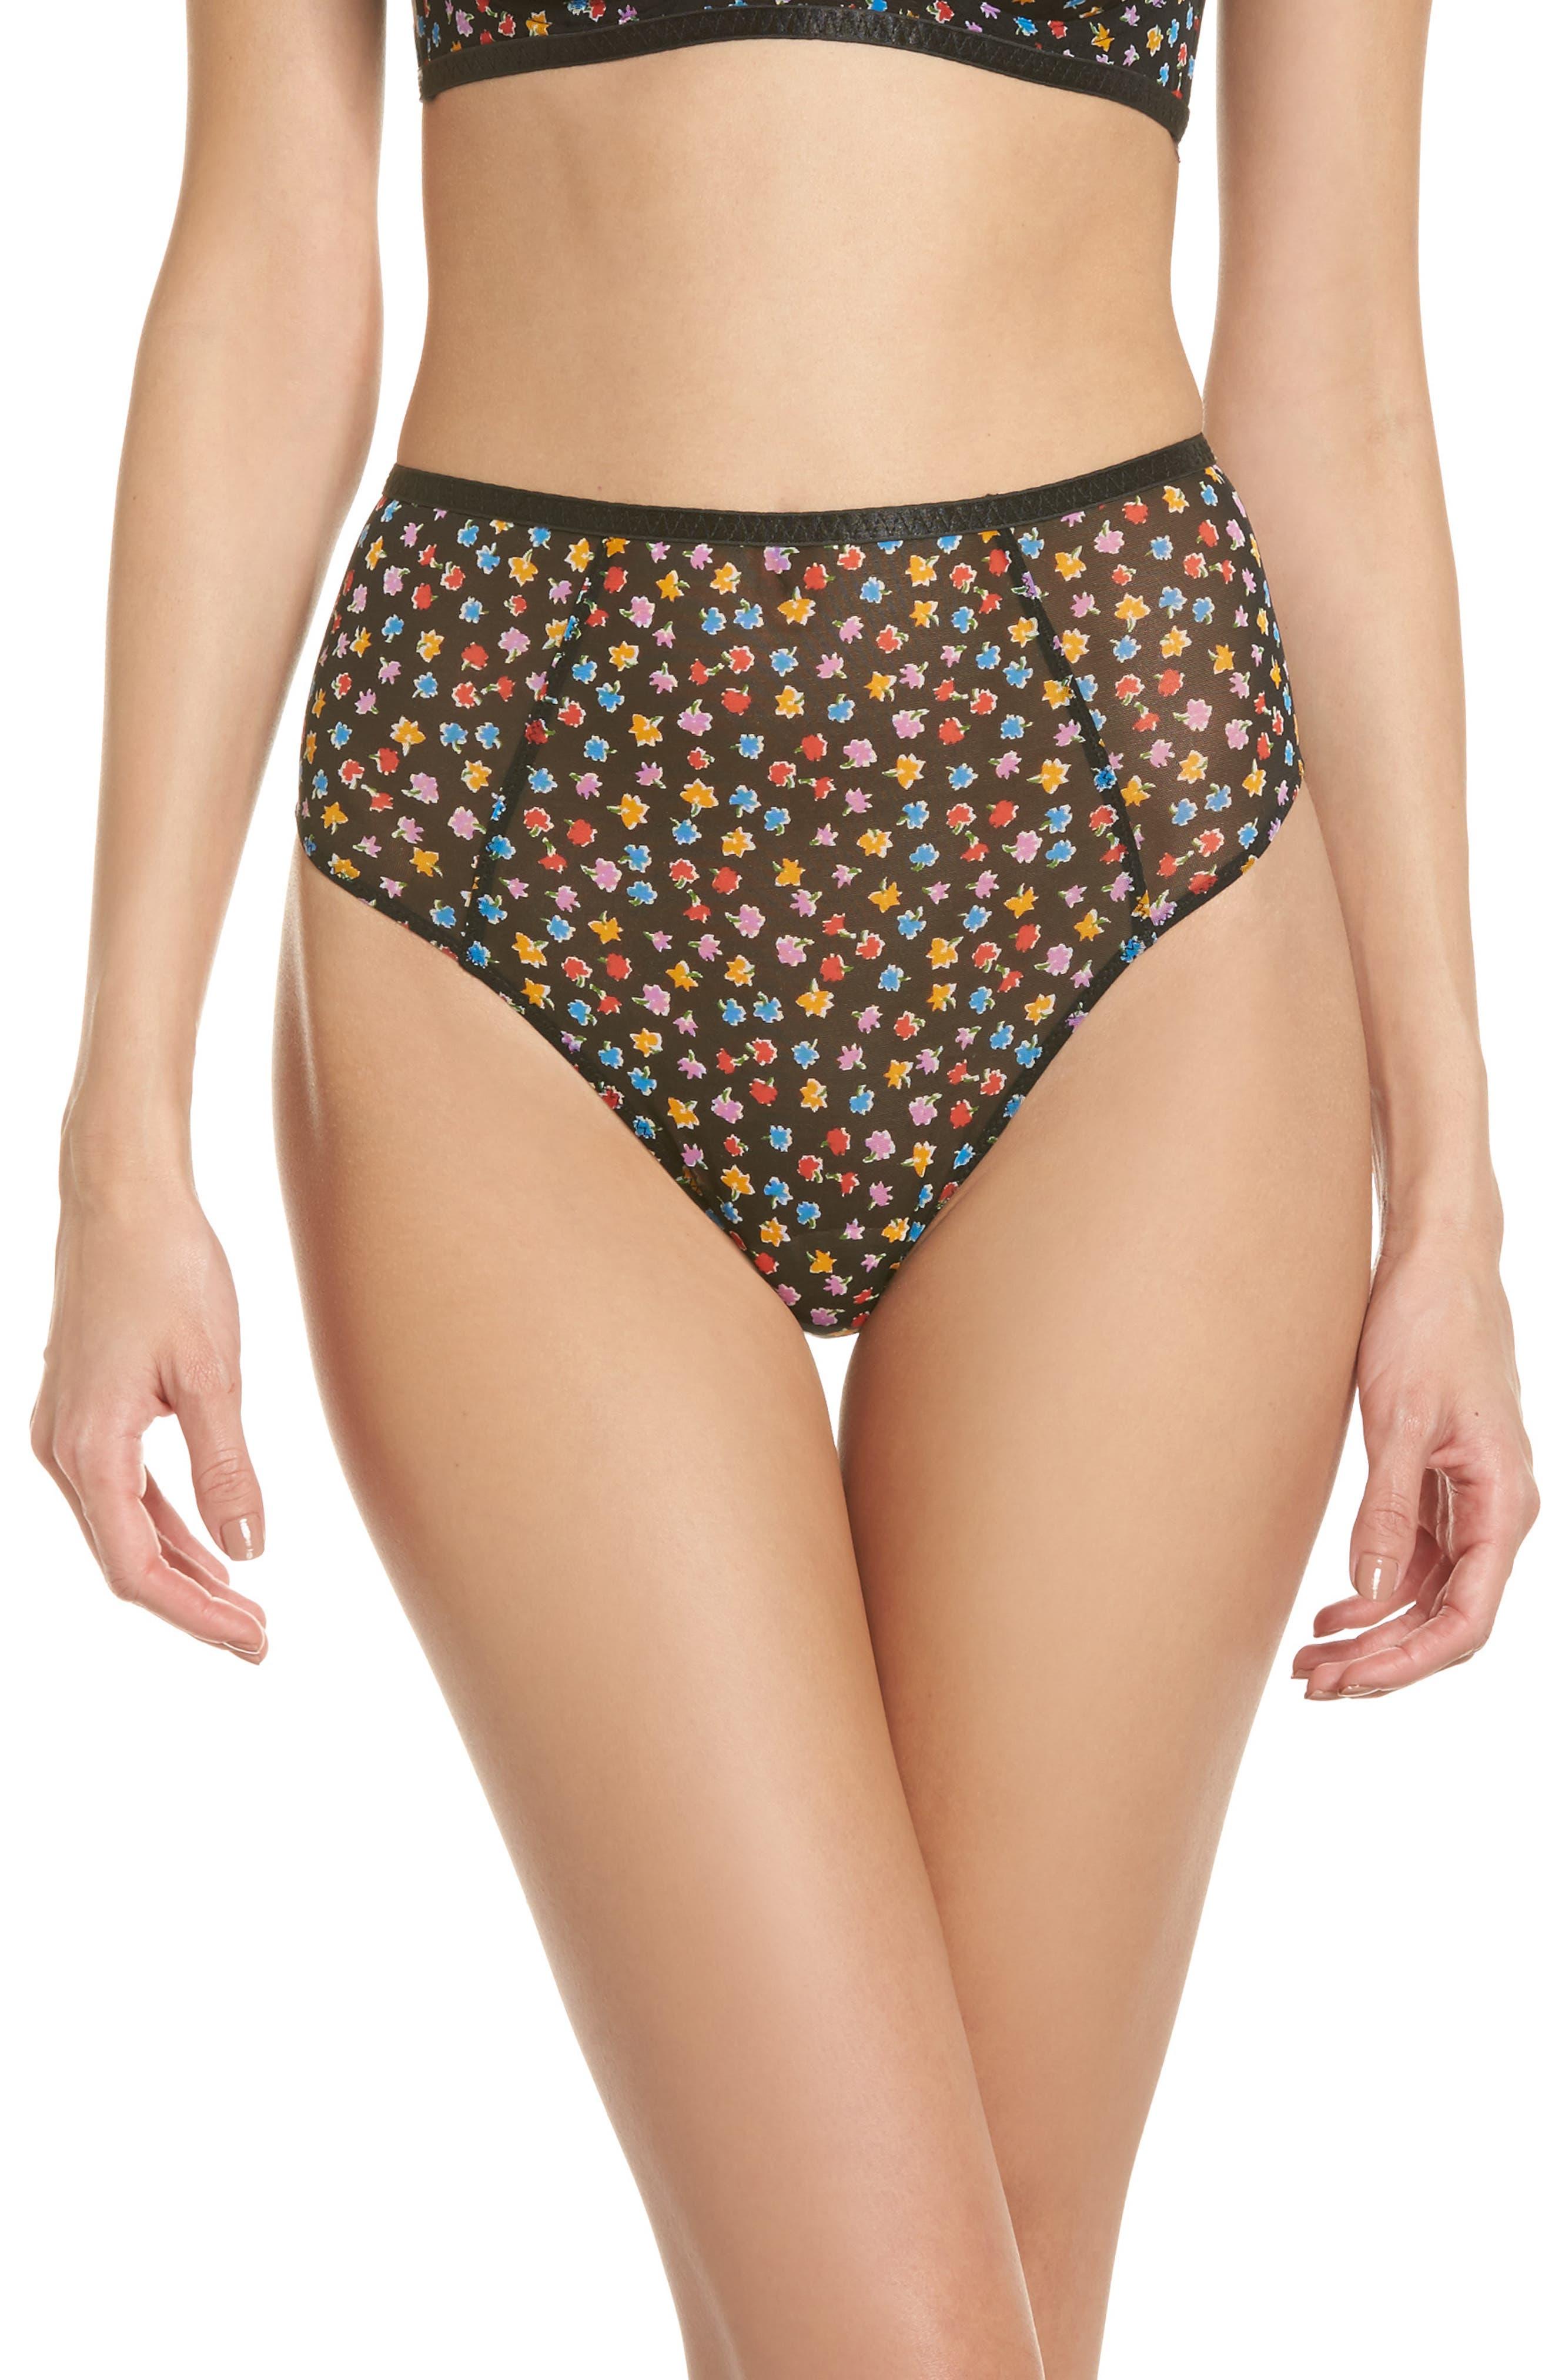 Intimately FP Capri High Waist Panties,                         Main,                         color, Black Combo